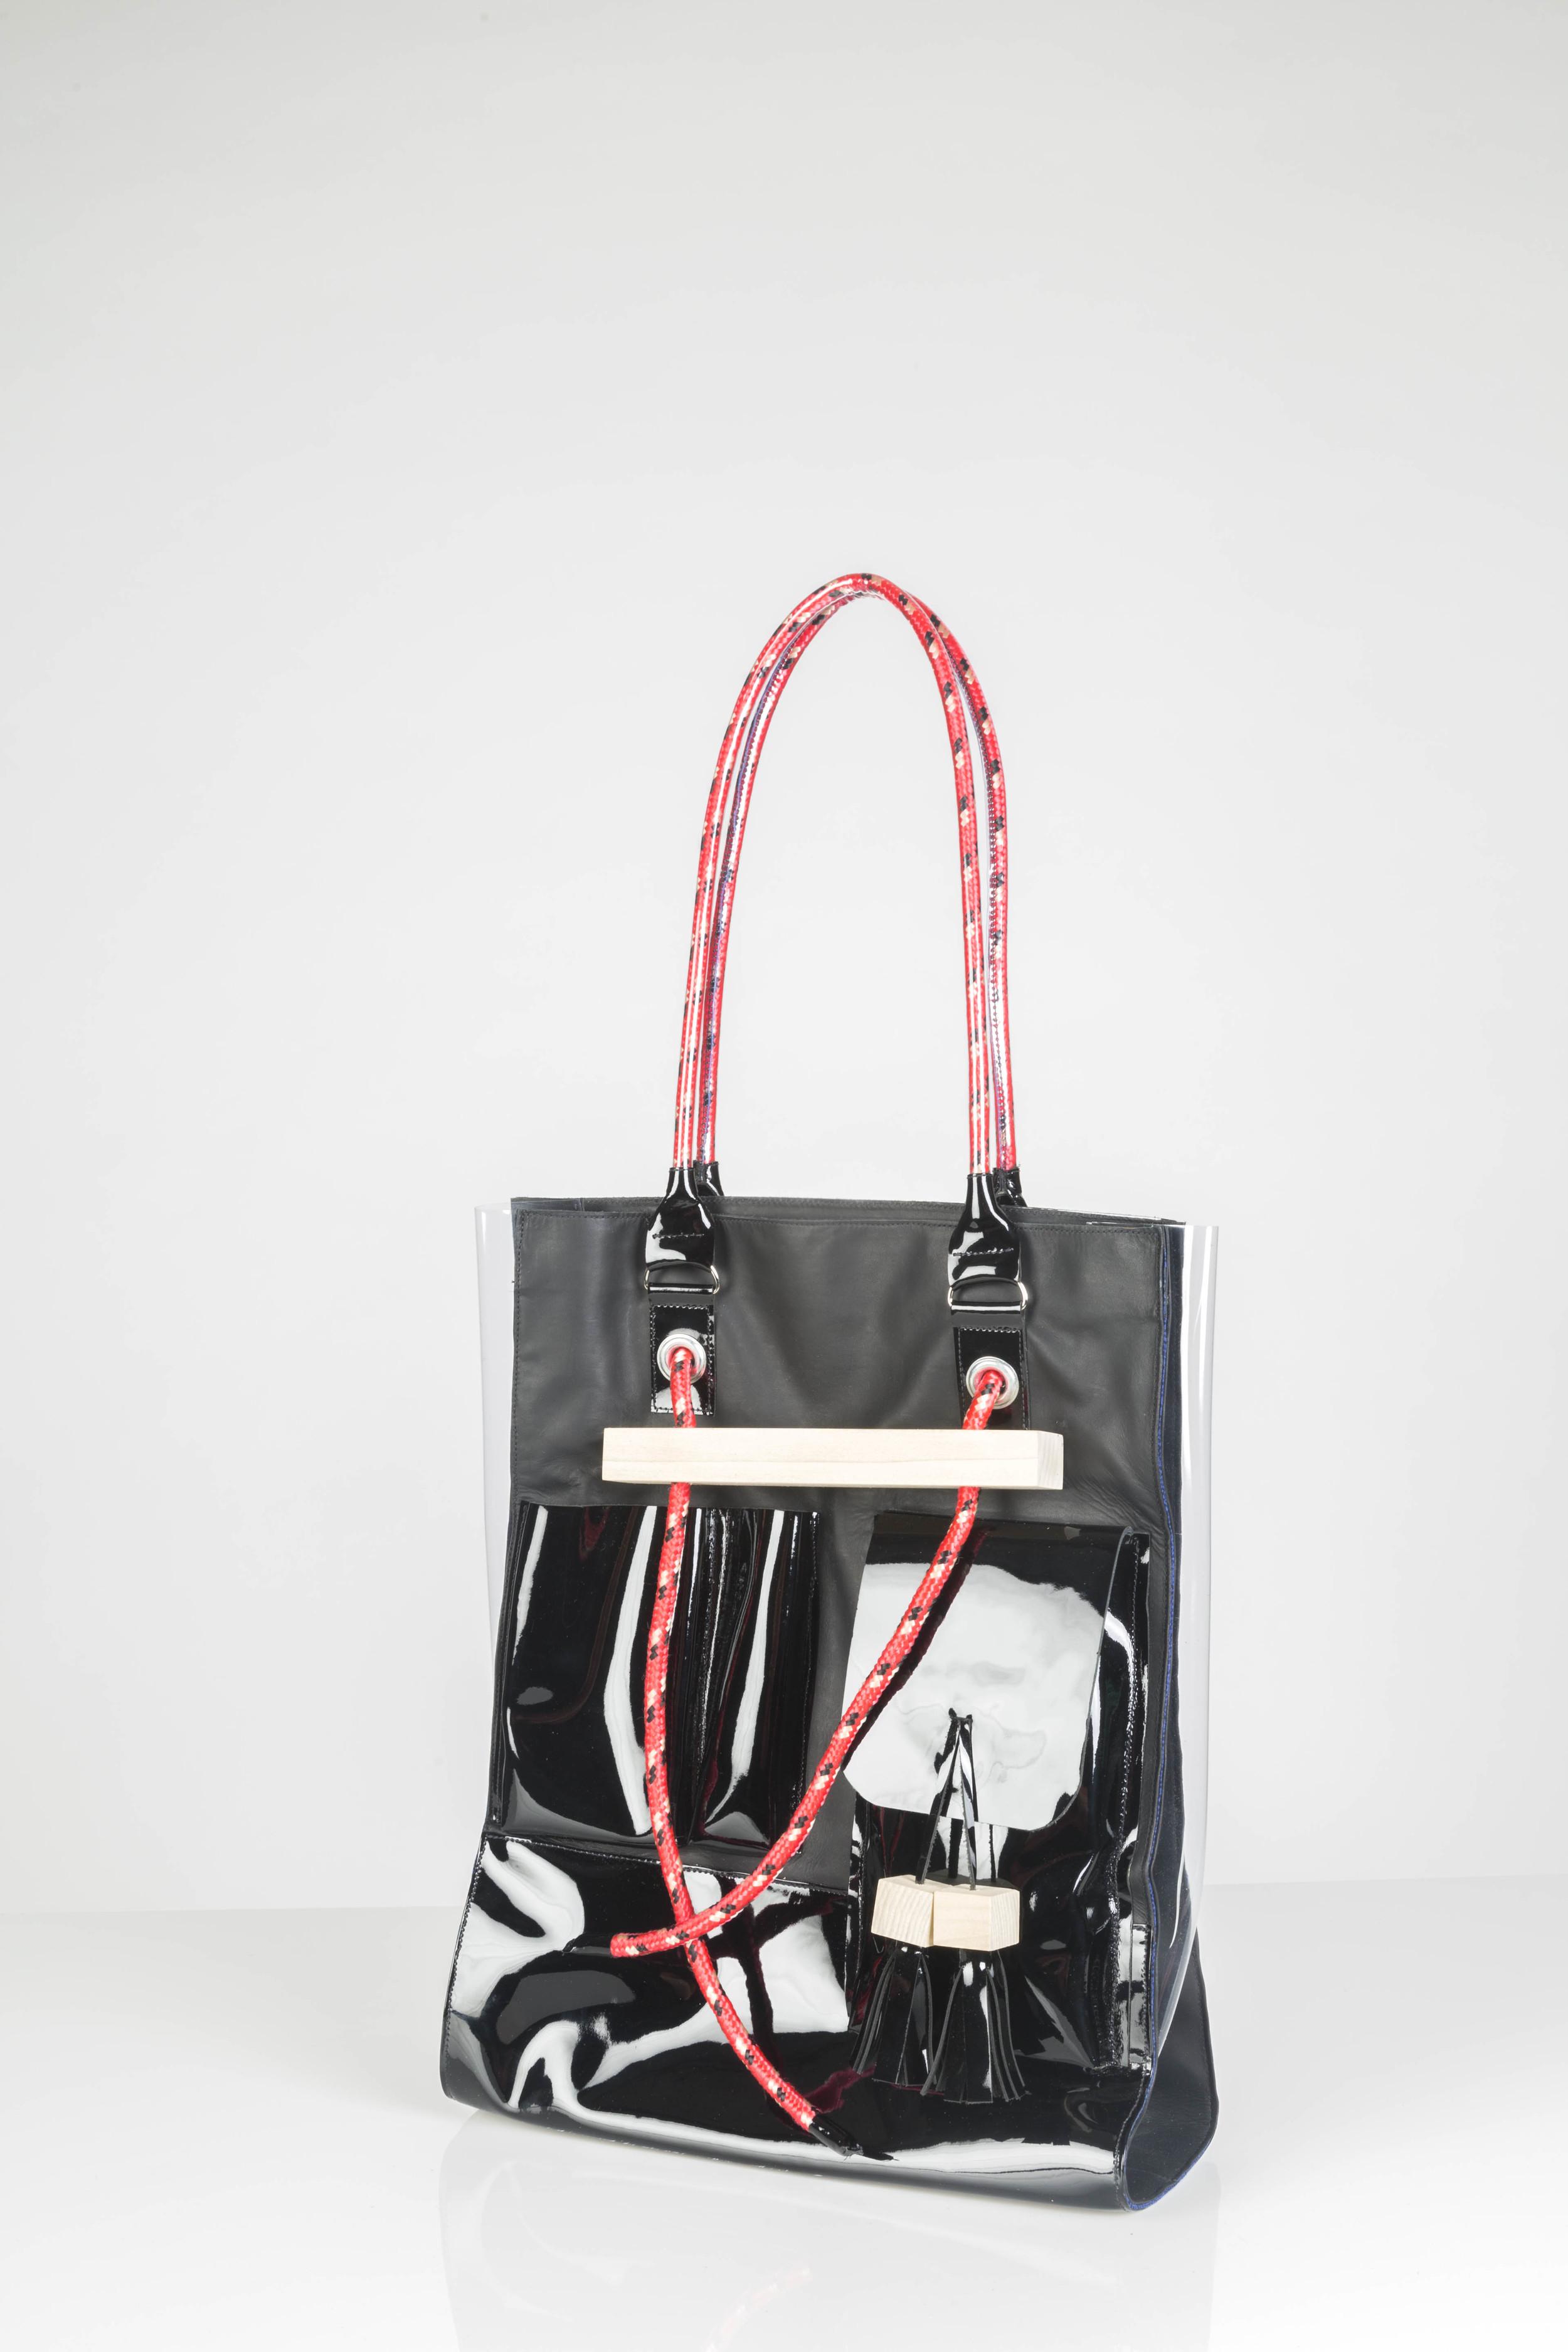 LITERALLYHandbags-14.jpg